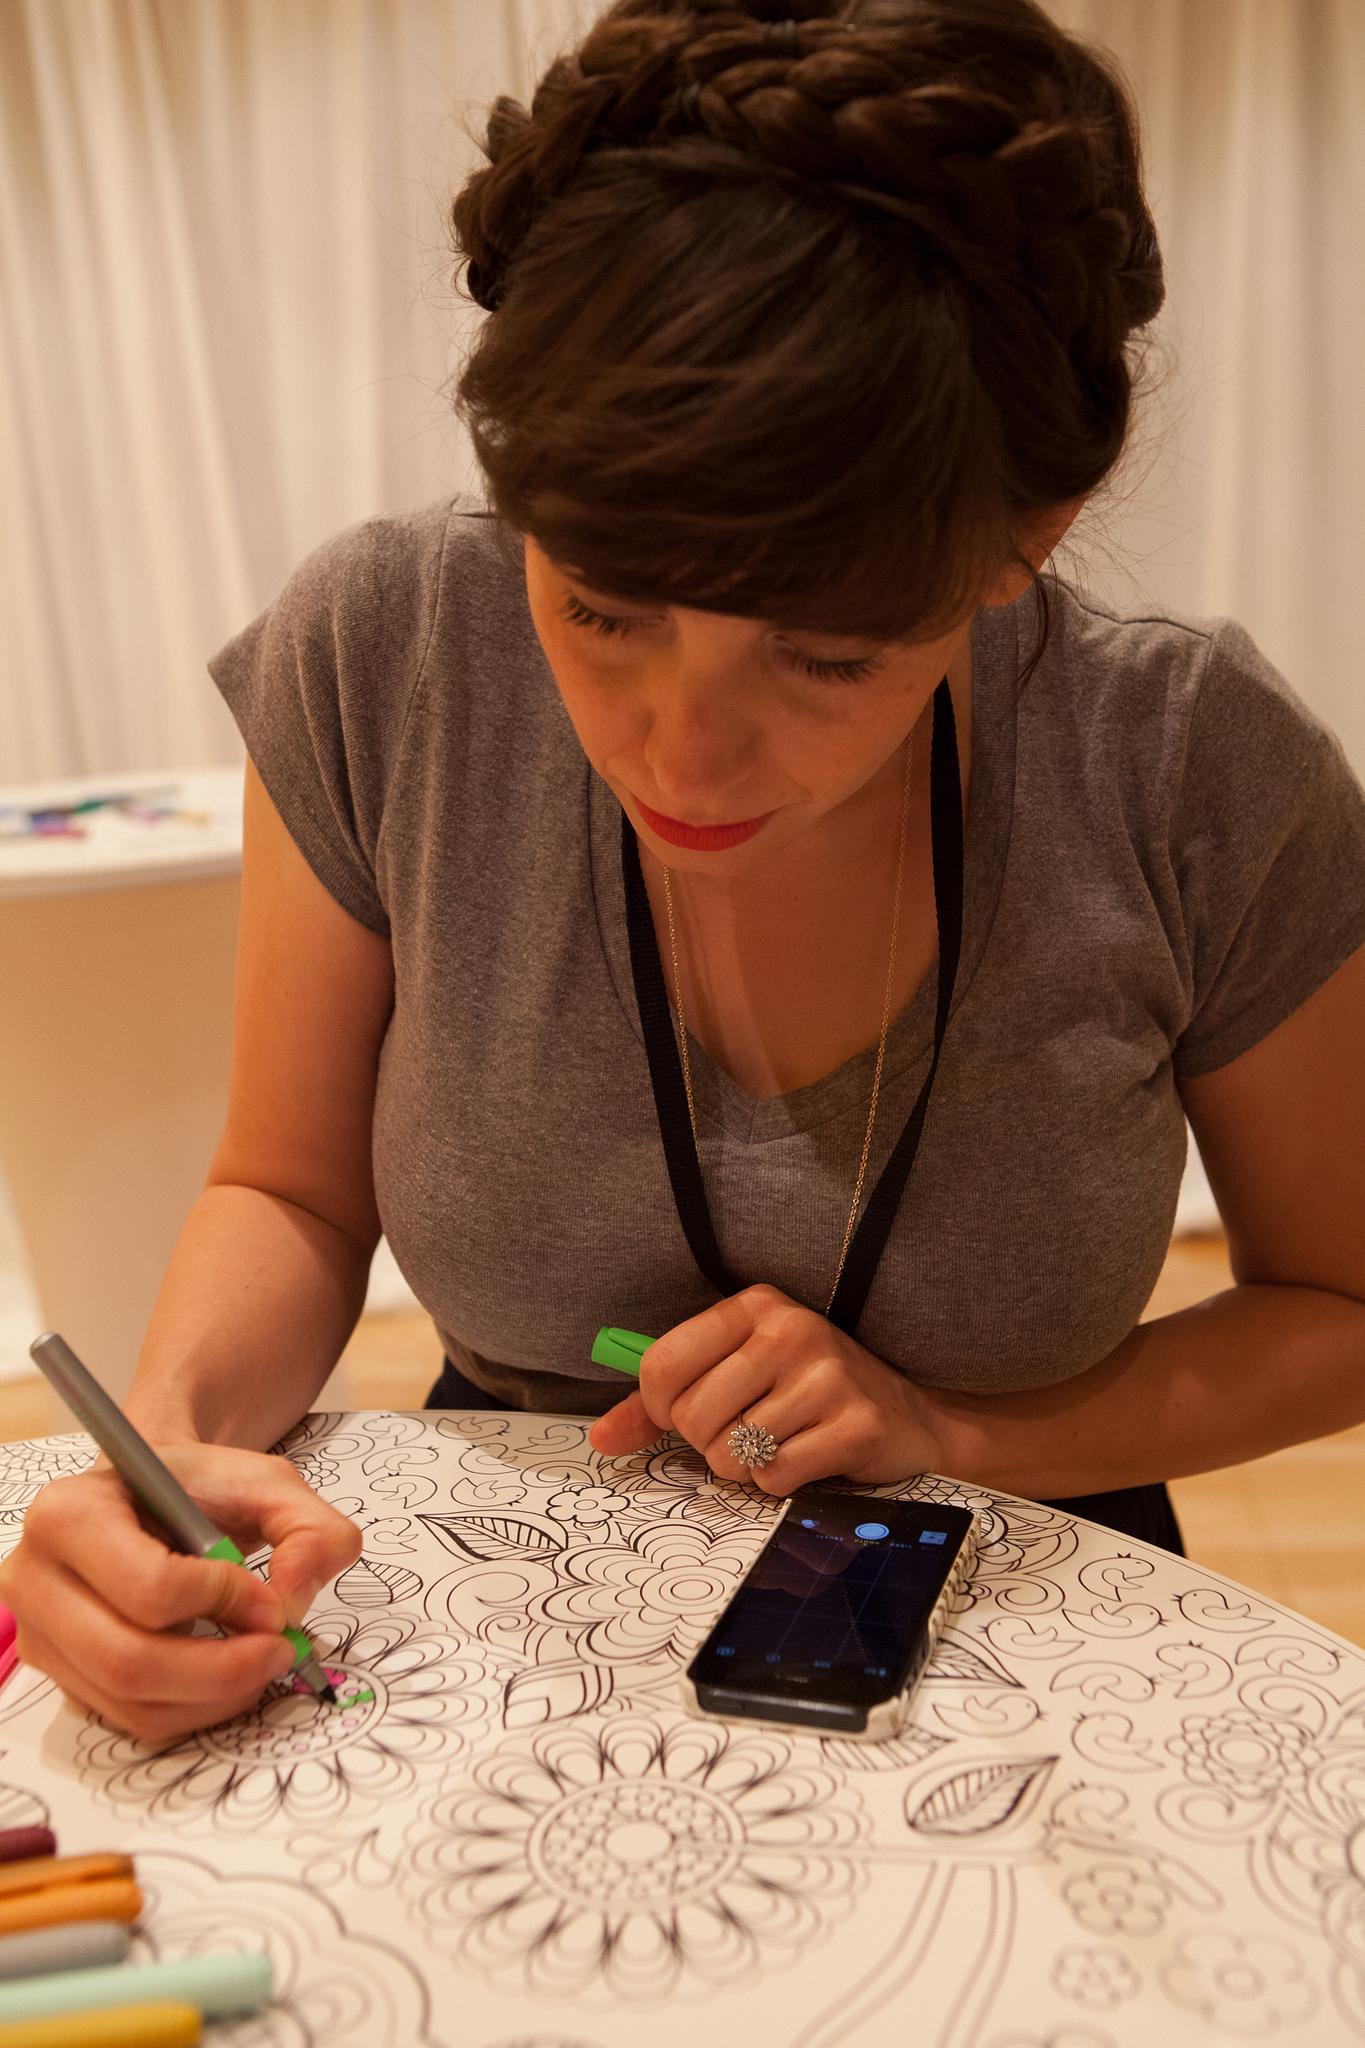 Alt Summer 2015 Squarespace Lounge featuring Artwork by Jenean Morrison.  photo credit: Alt Summit